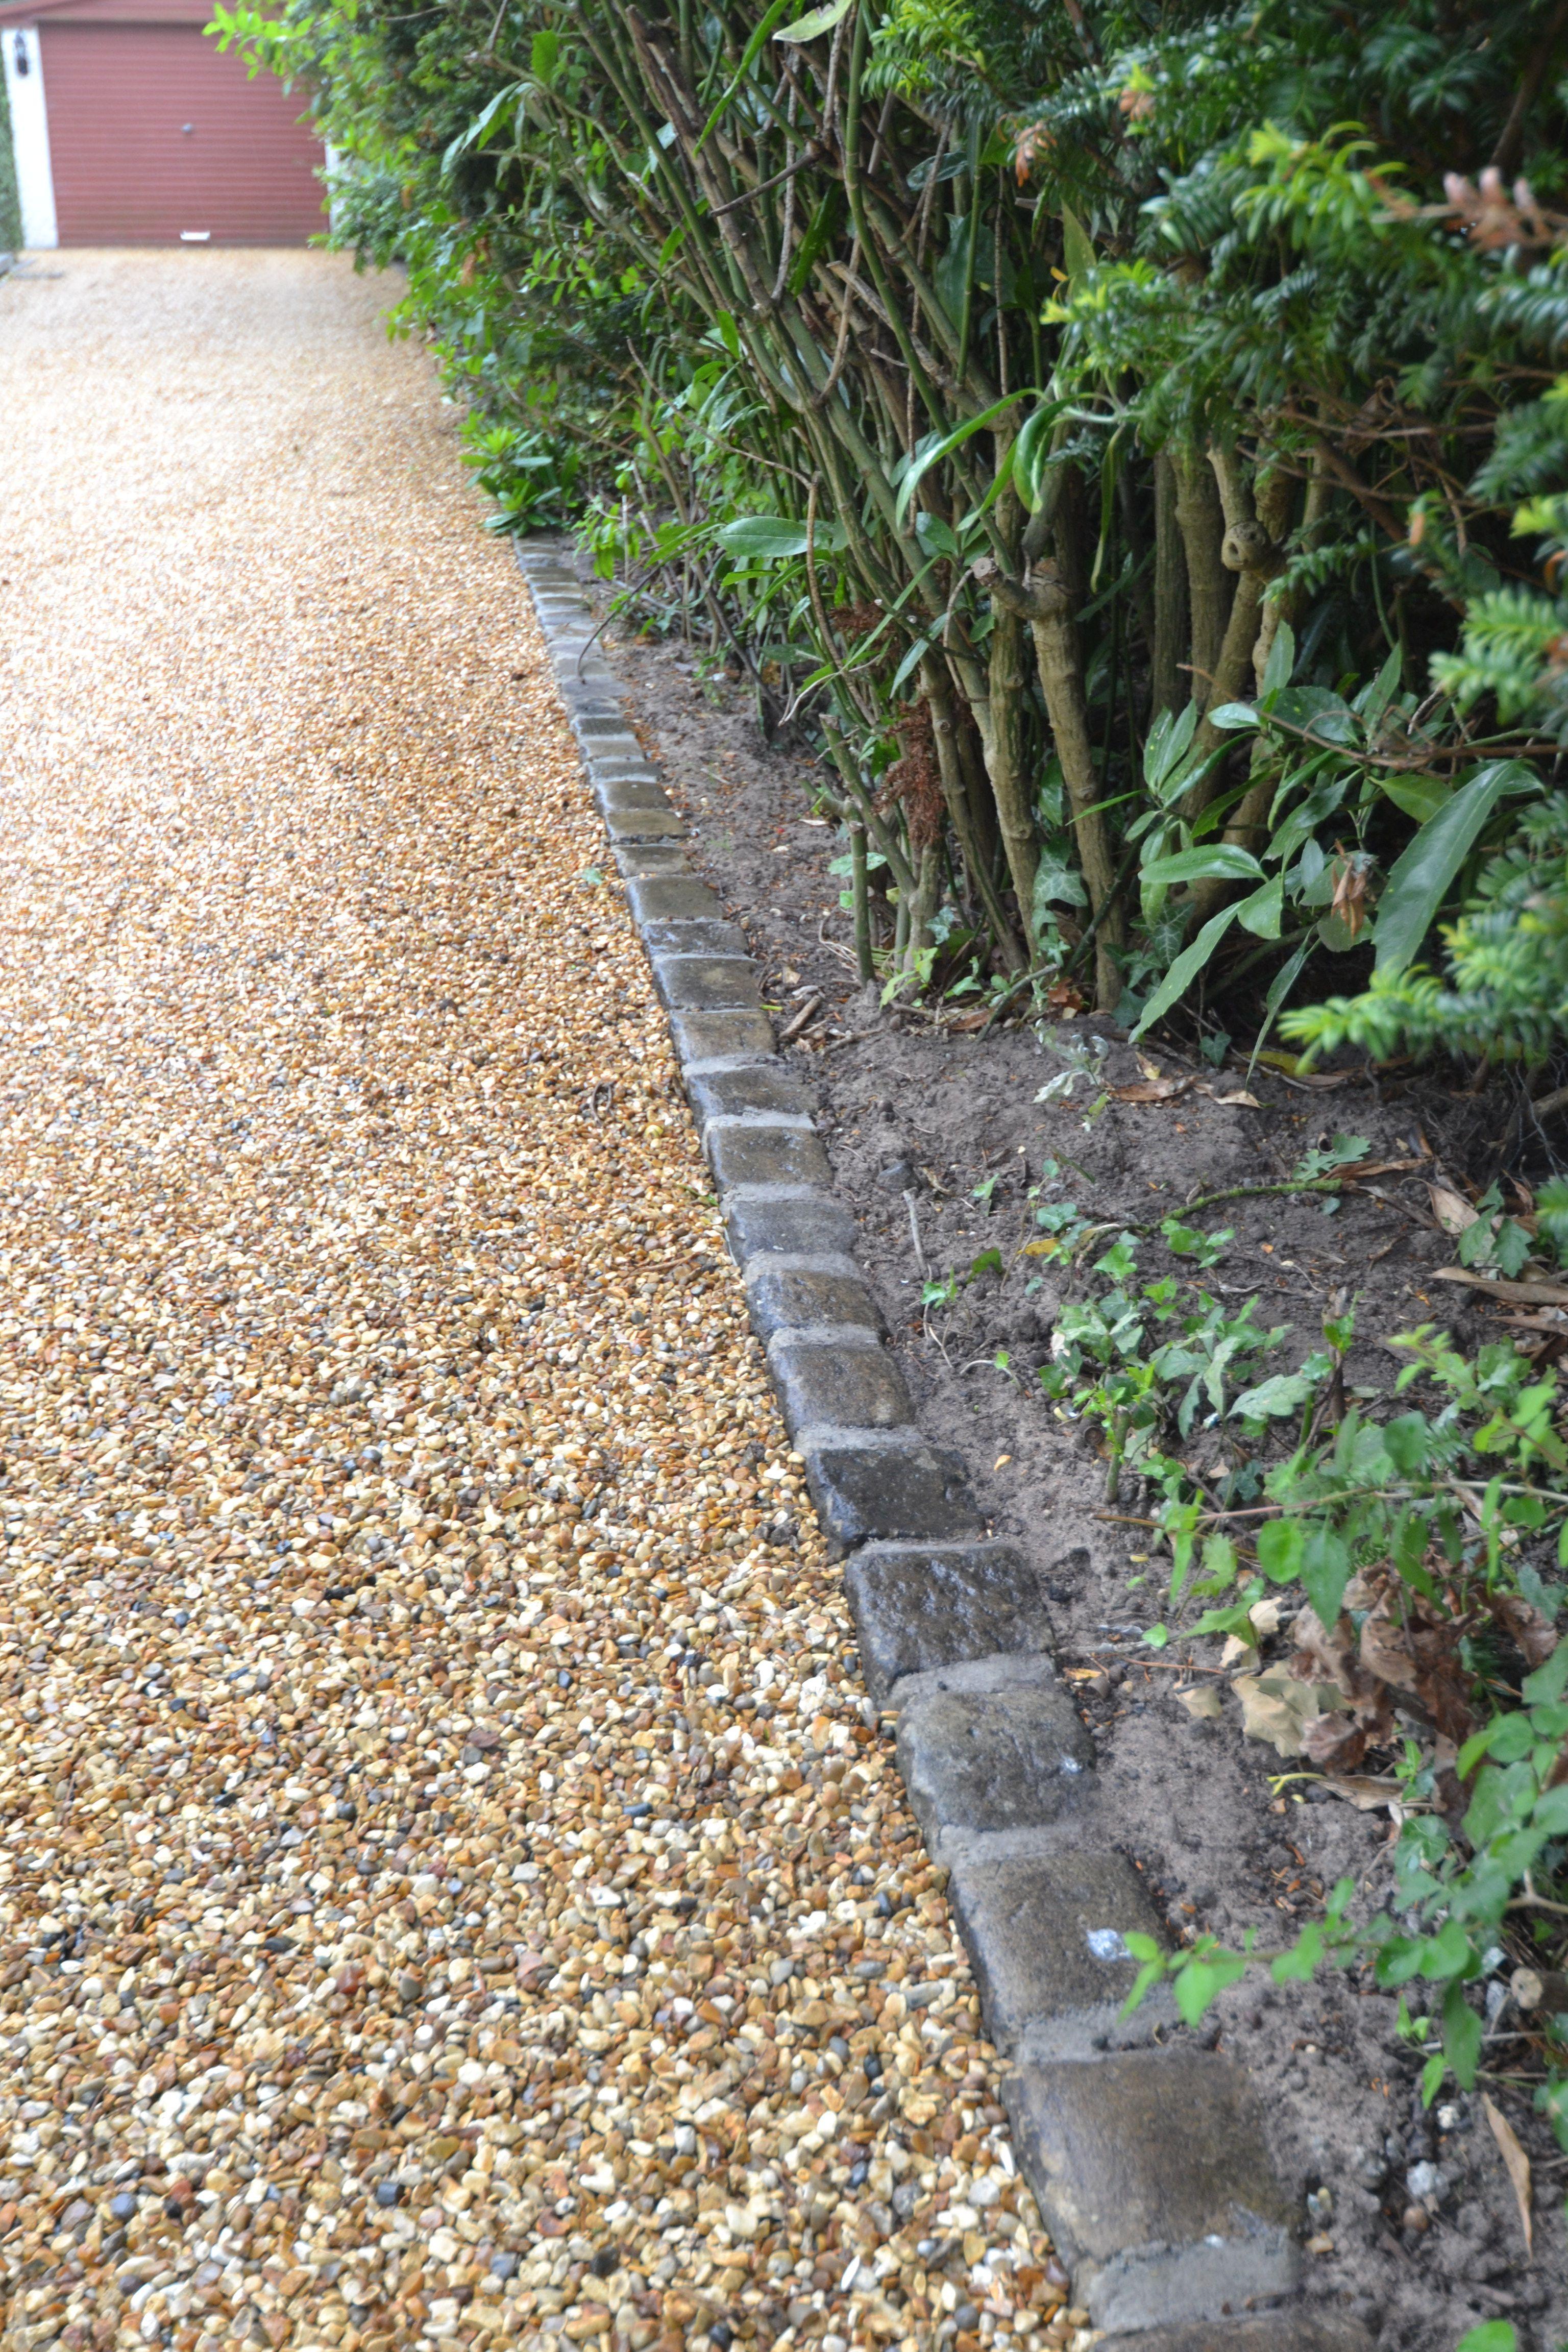 Reclaimed Setts For Edging Of Stabilised Gravel Driveway In